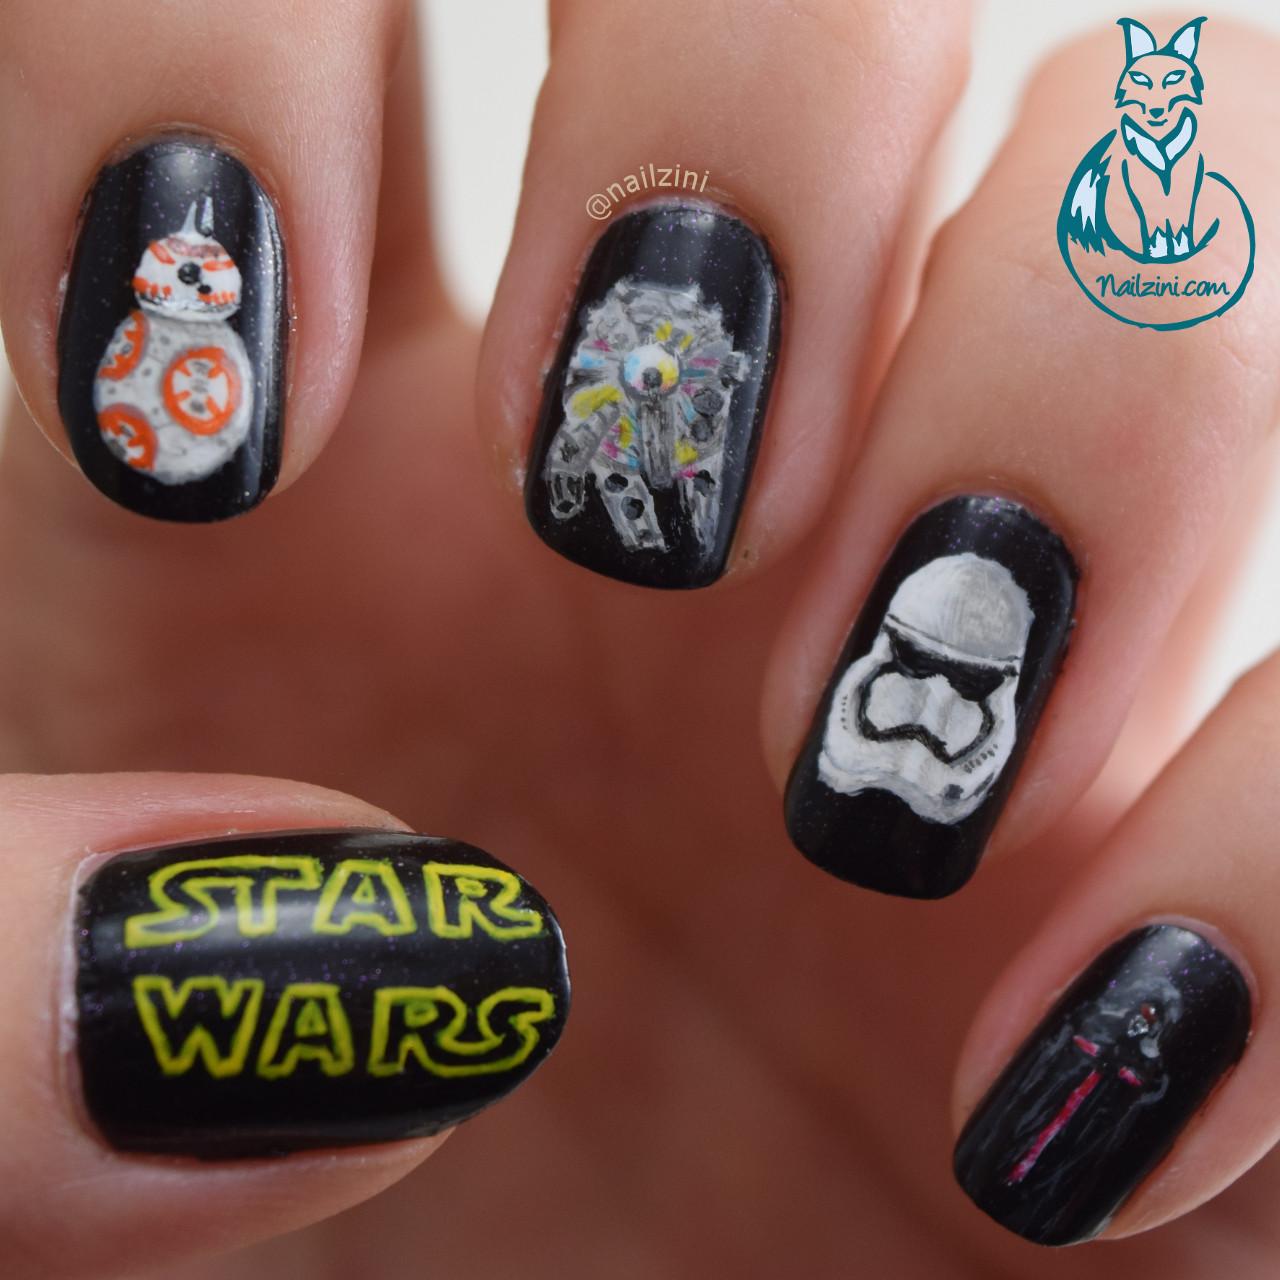 Star Wars: The Force Awakens nail art